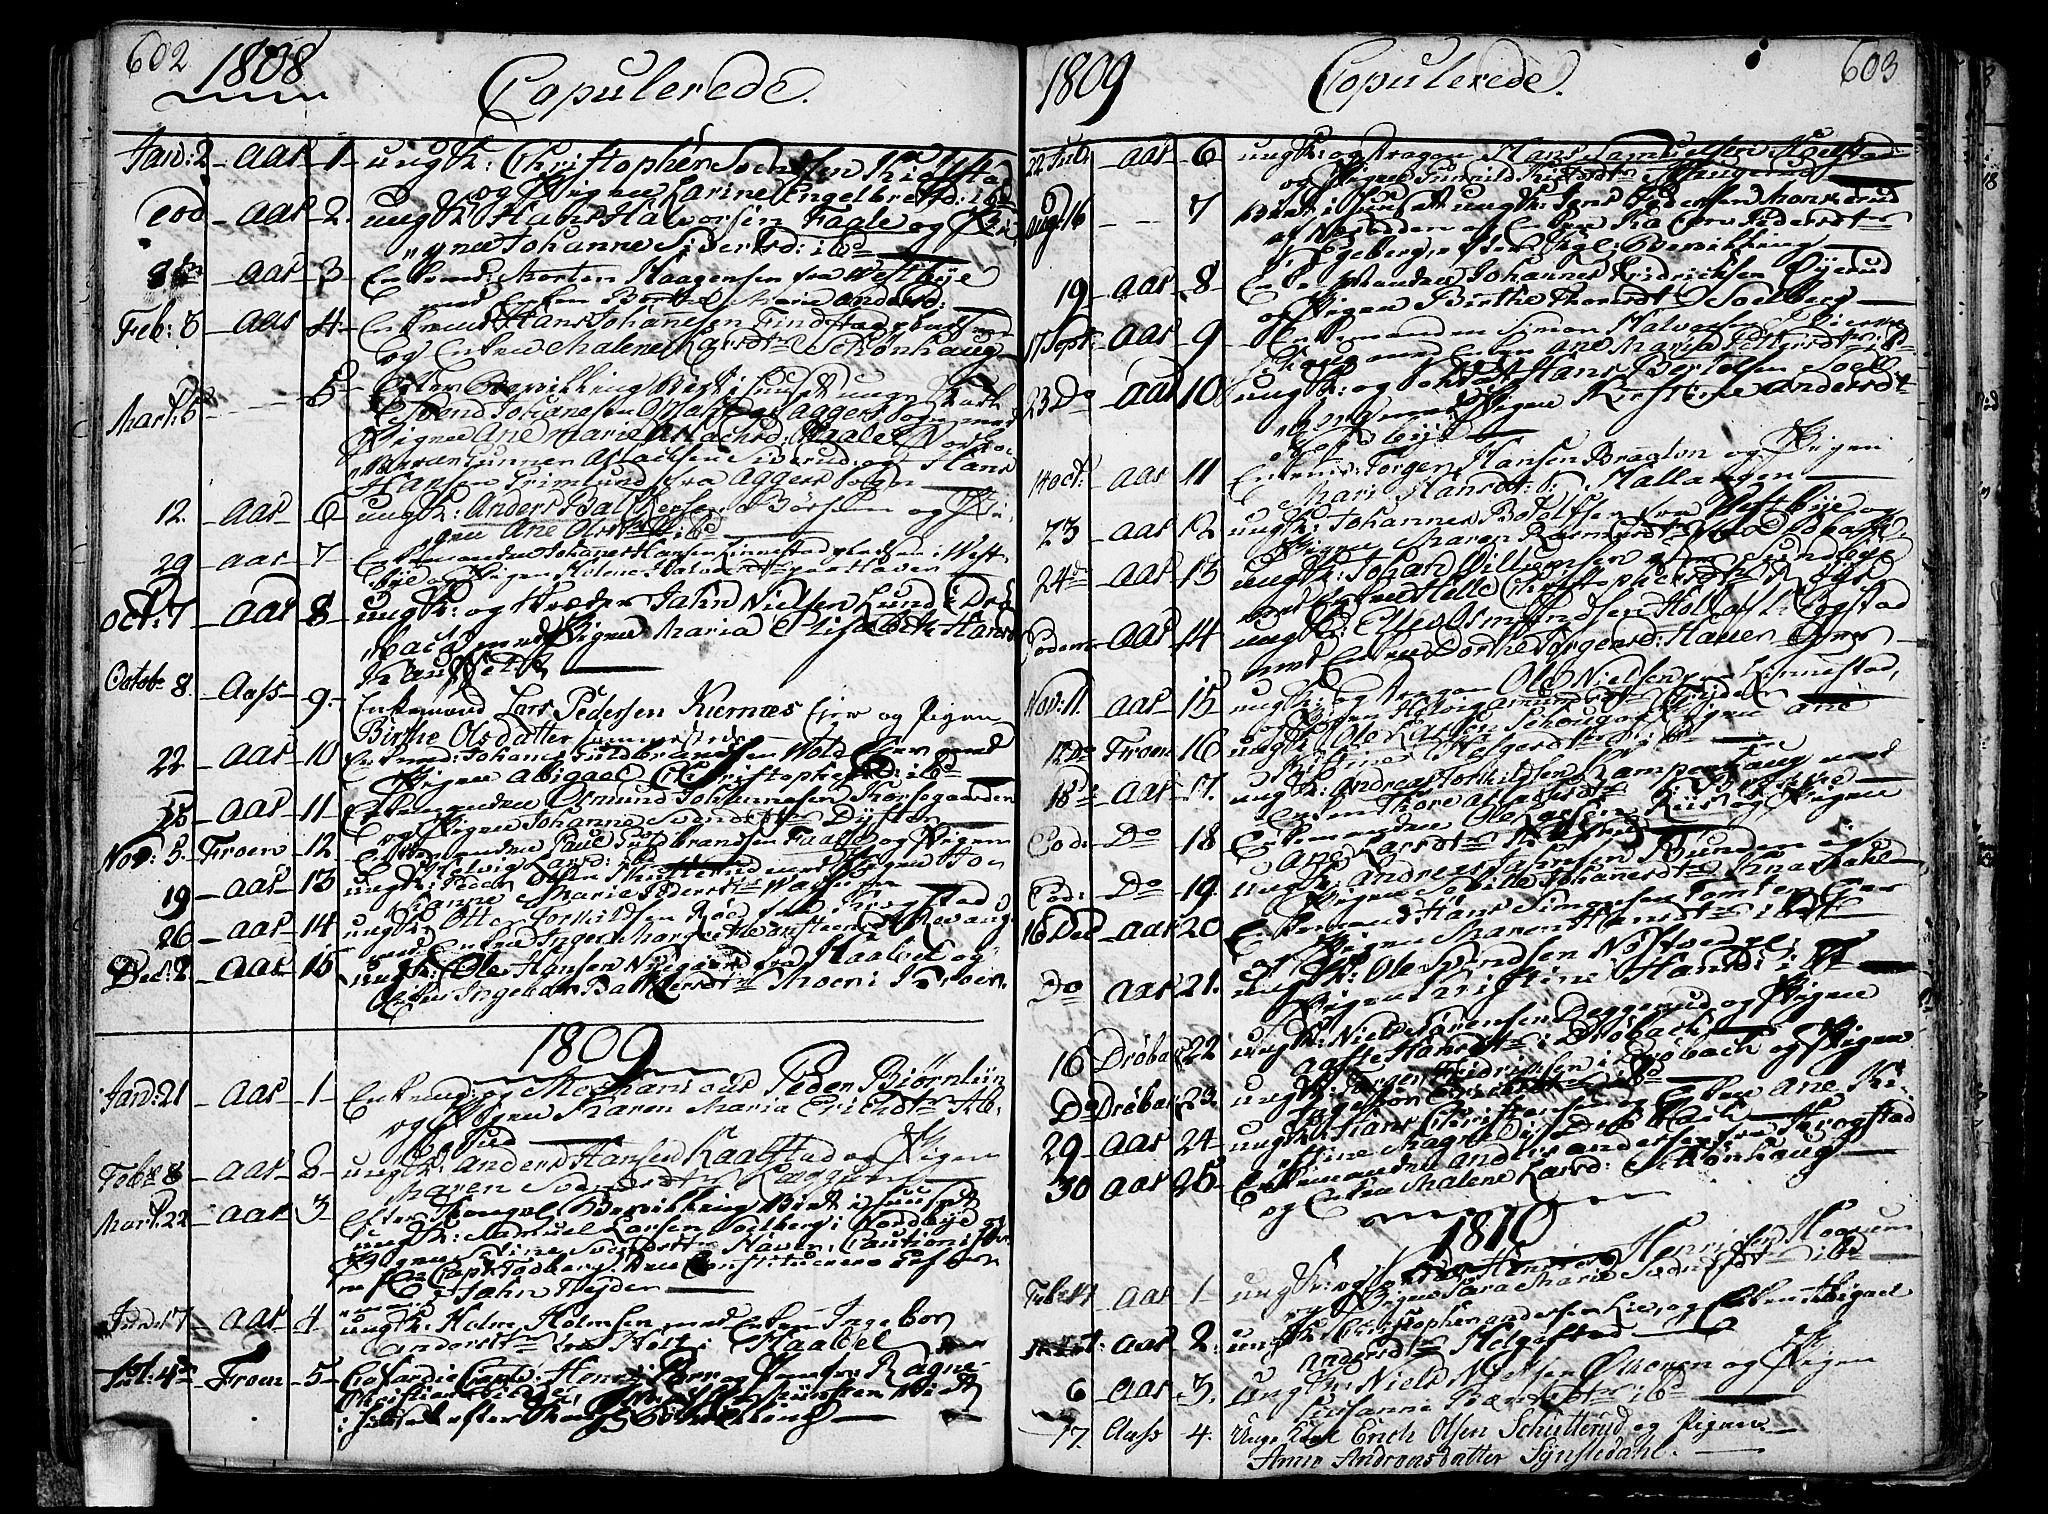 SAO, Ås prestekontor Kirkebøker, F/Fa/L0002: Ministerialbok nr. I 2, 1778-1813, s. 602-603